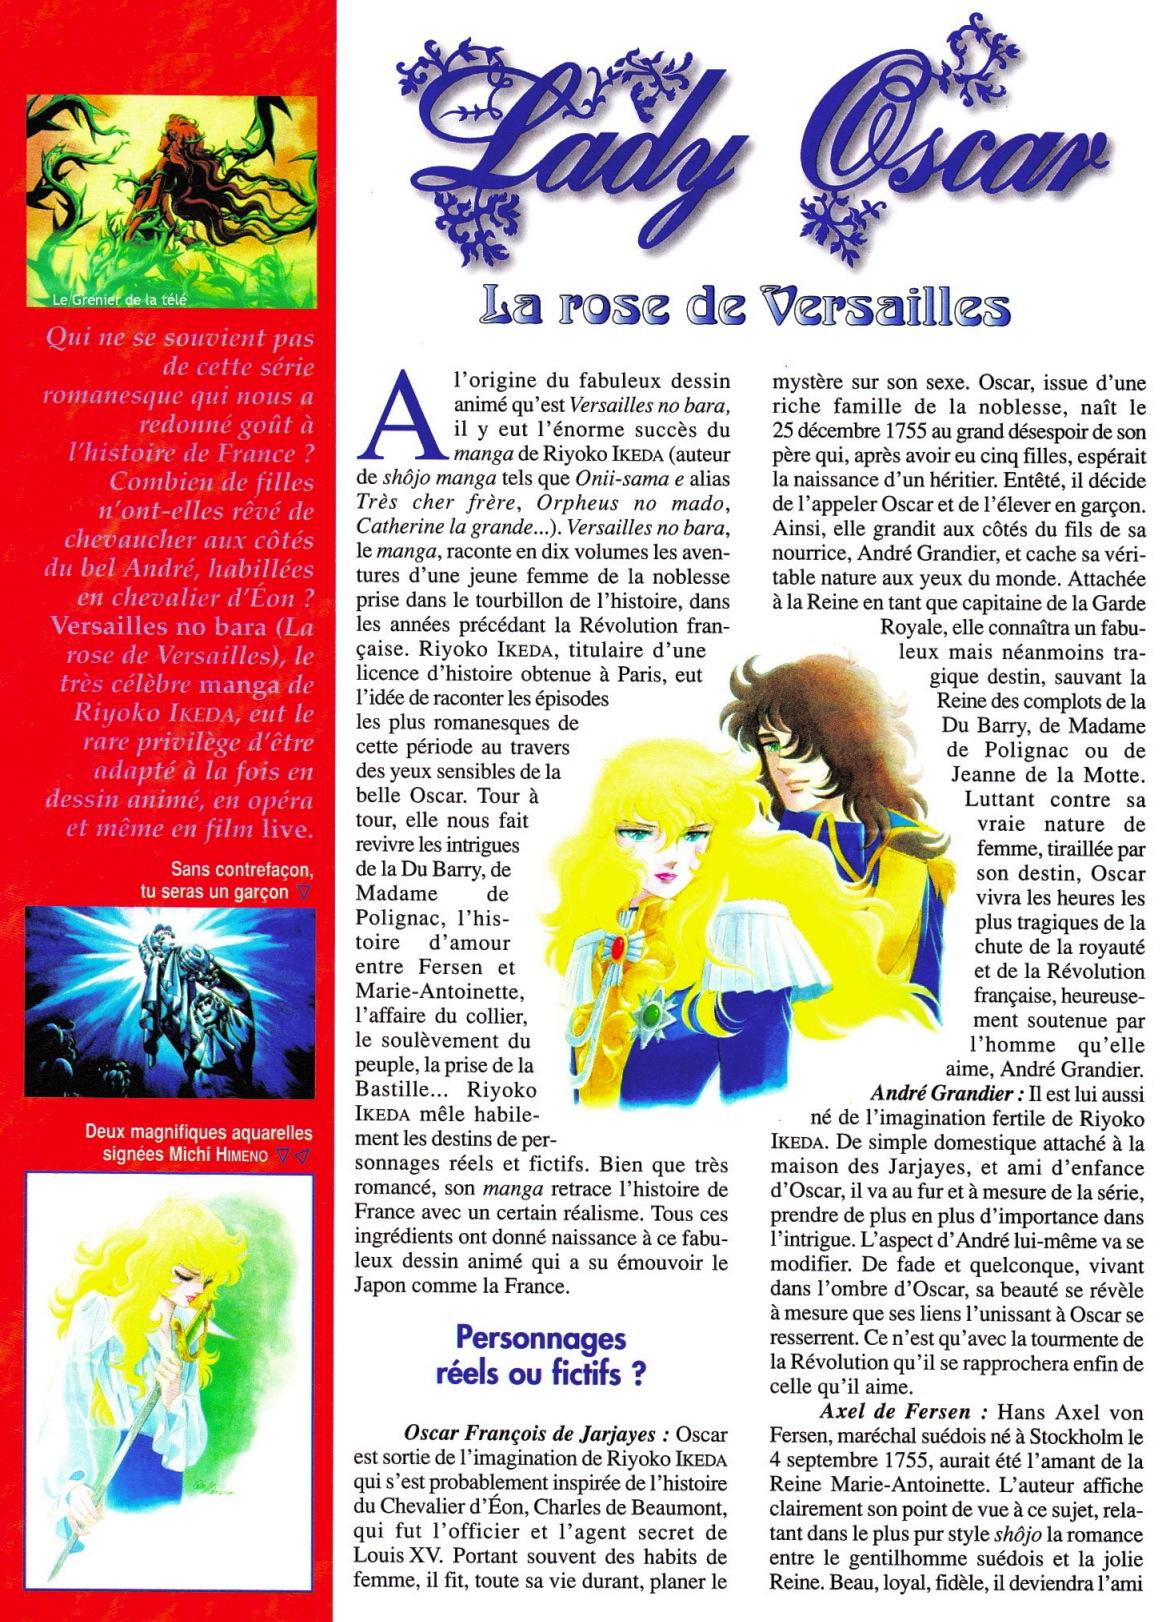 http://grenierdelatv.free.fr/2/LadyOscaral41mai199801.jpg